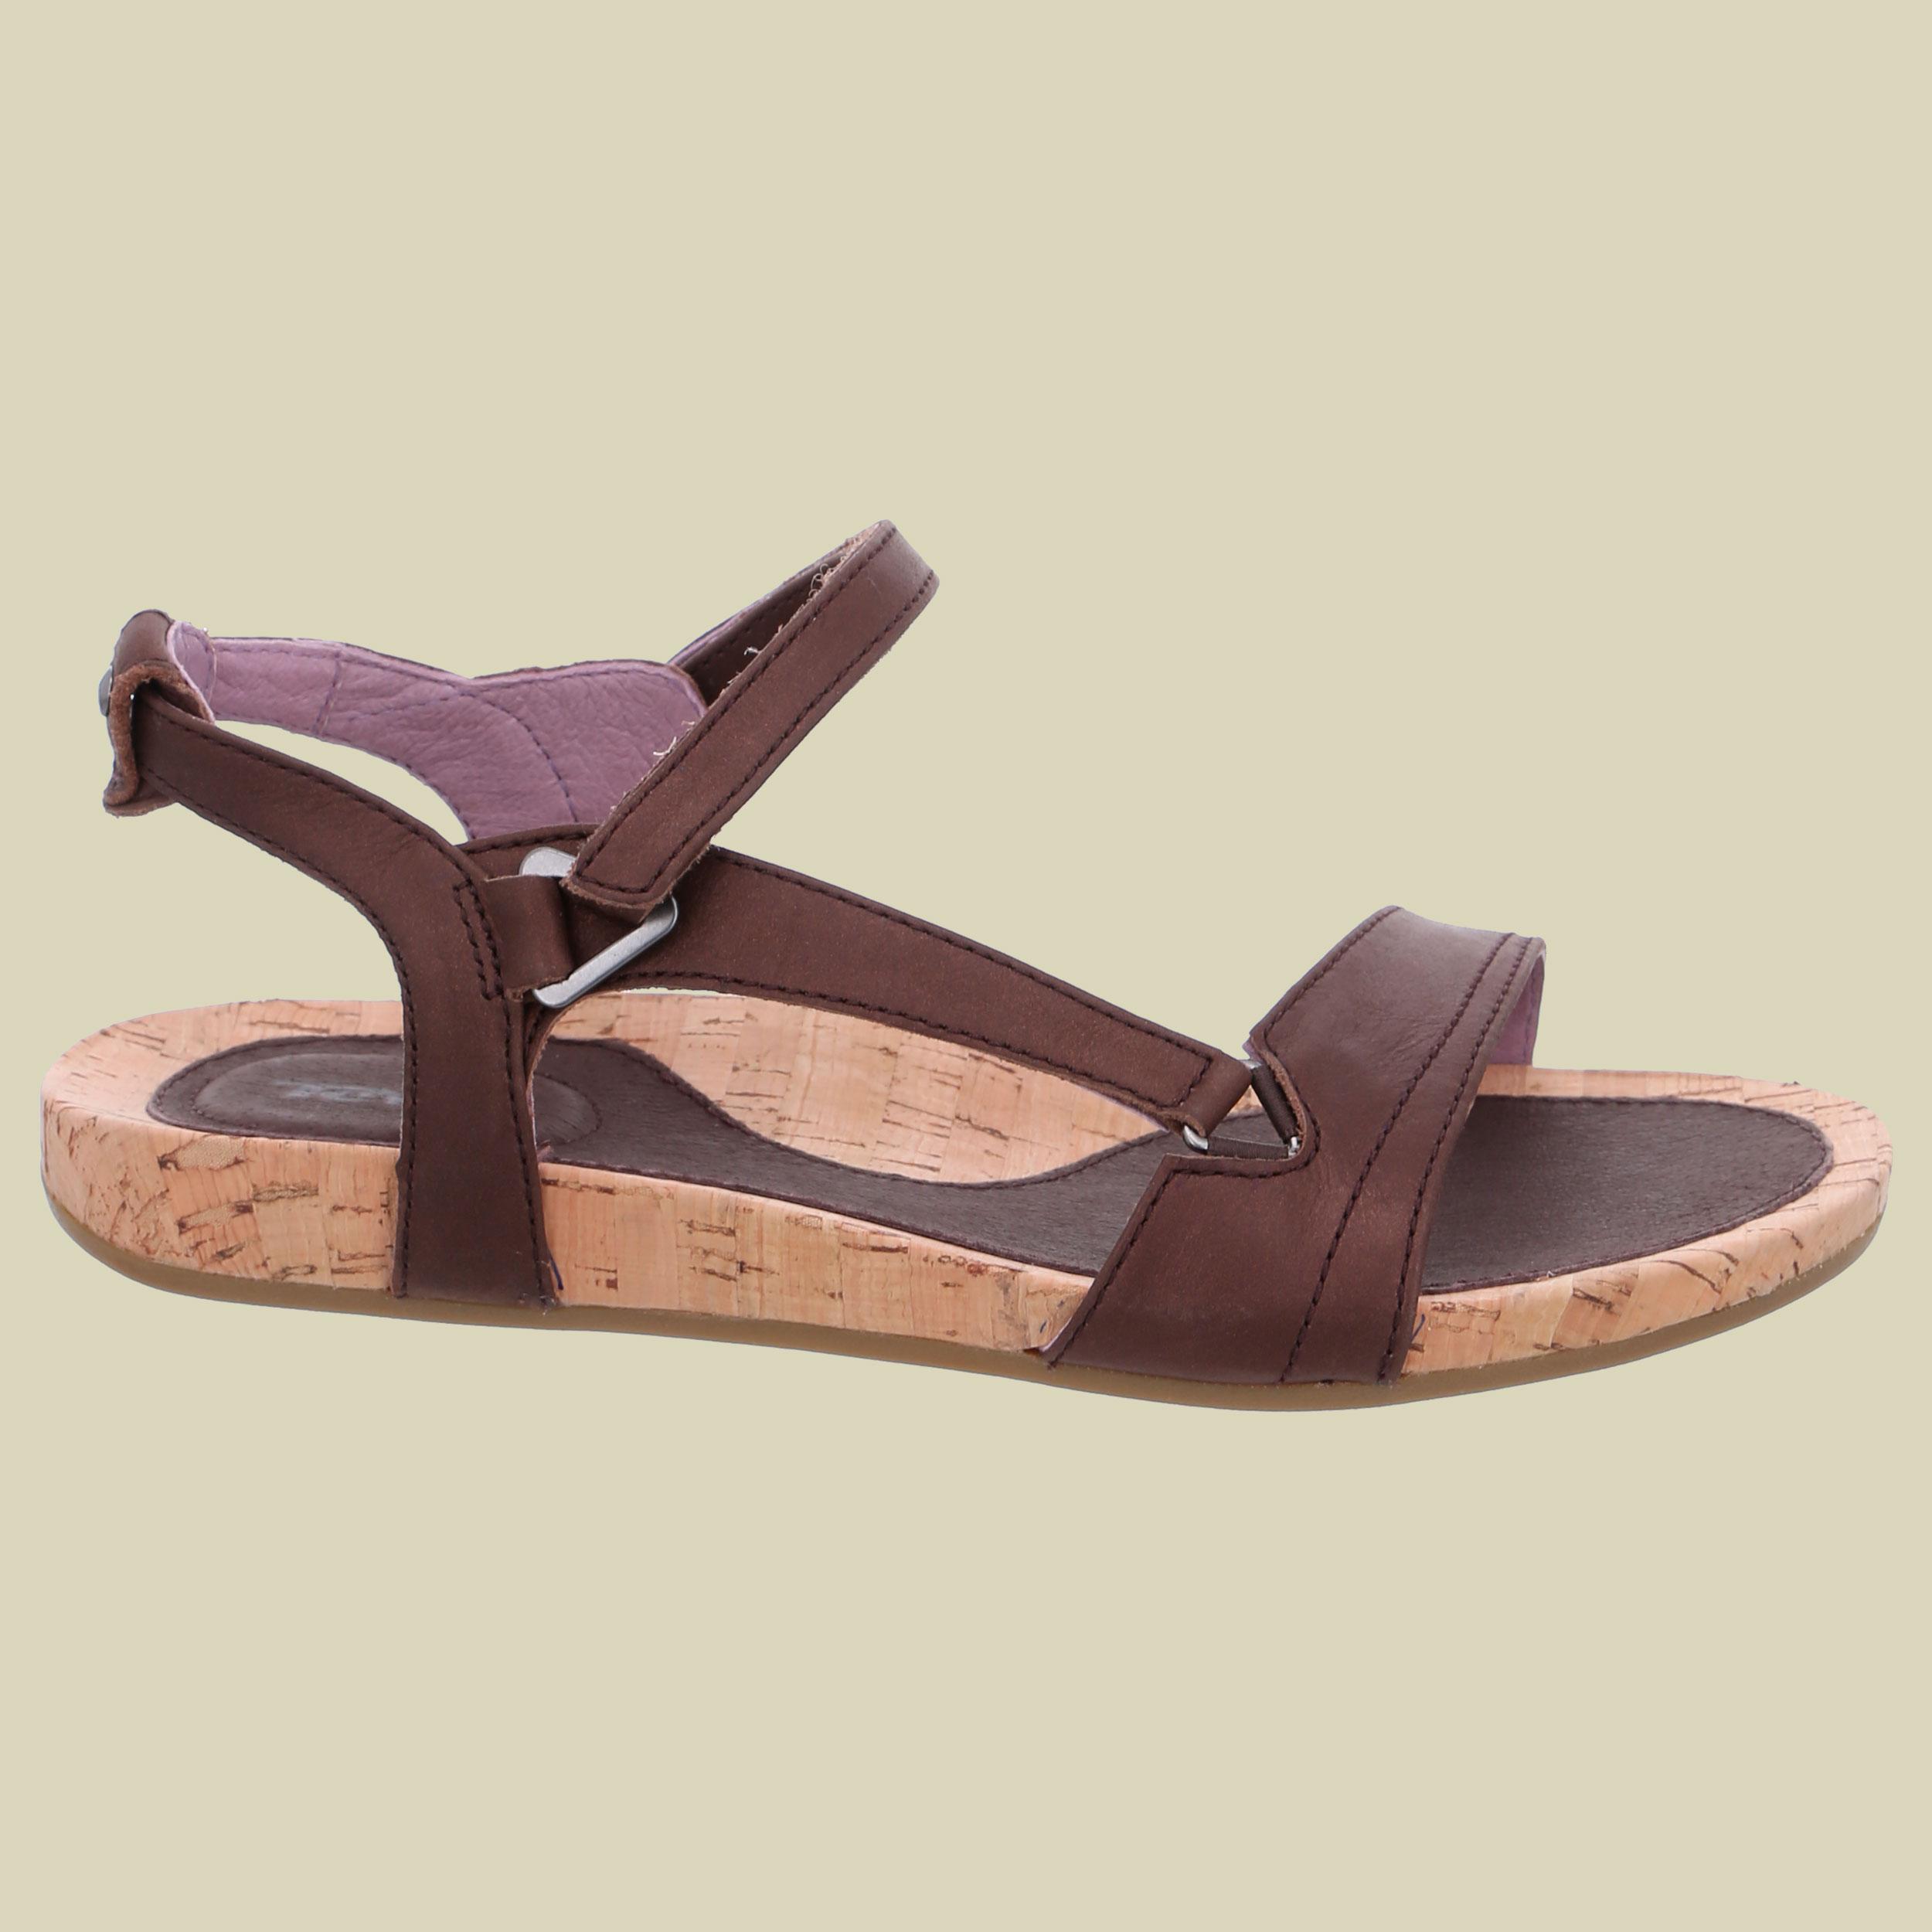 teva capri universal damen preisvergleich sandale g nstig kaufen bei. Black Bedroom Furniture Sets. Home Design Ideas